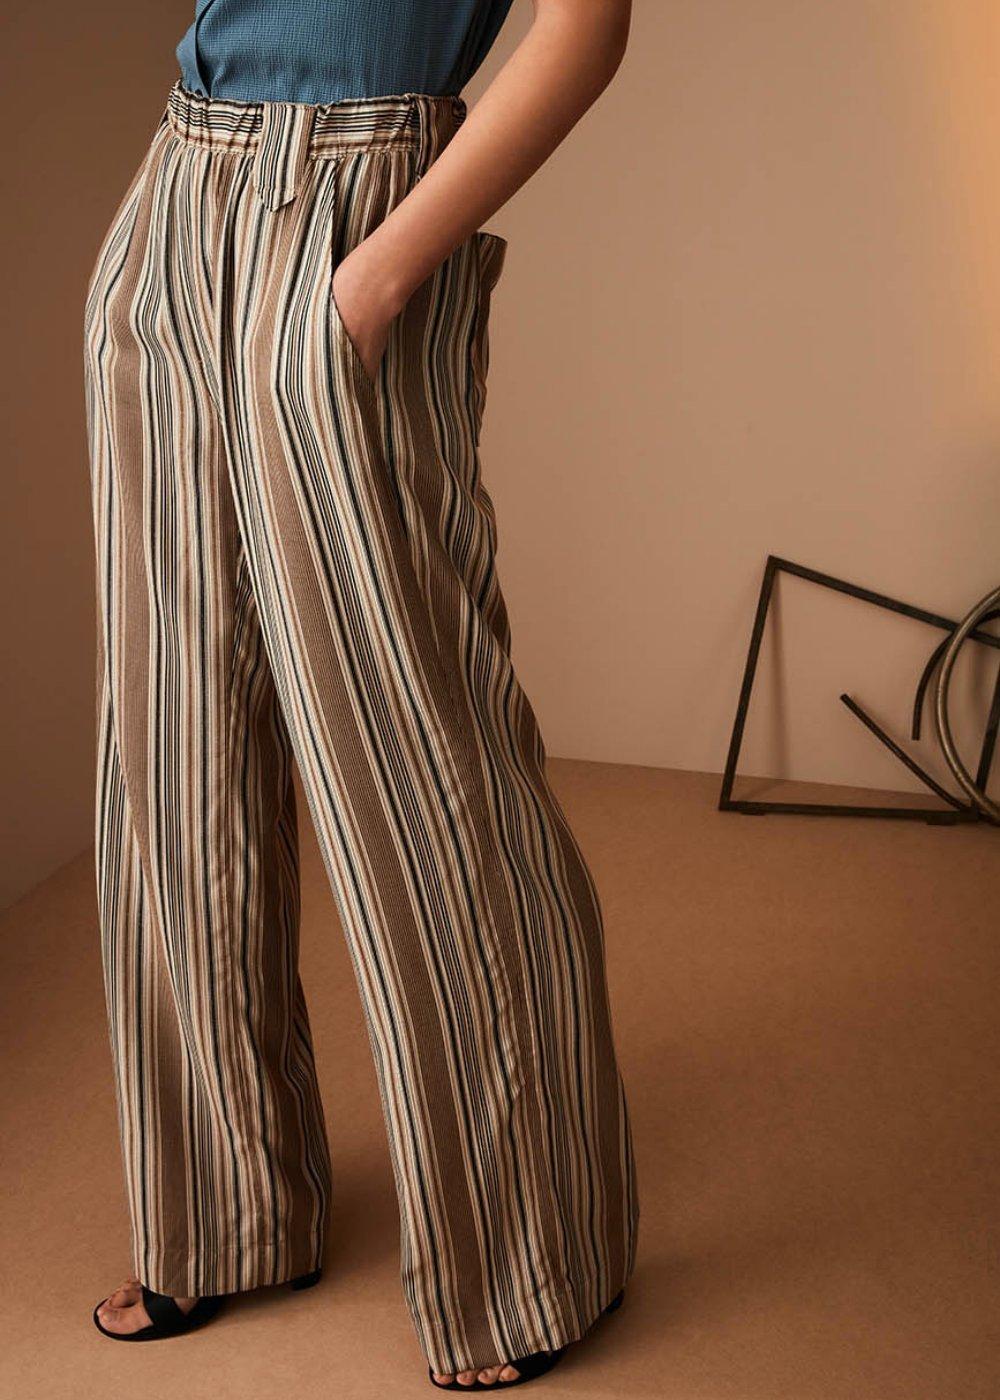 Peter palazzo trousers - Safari / Taupe Fantasia - Woman